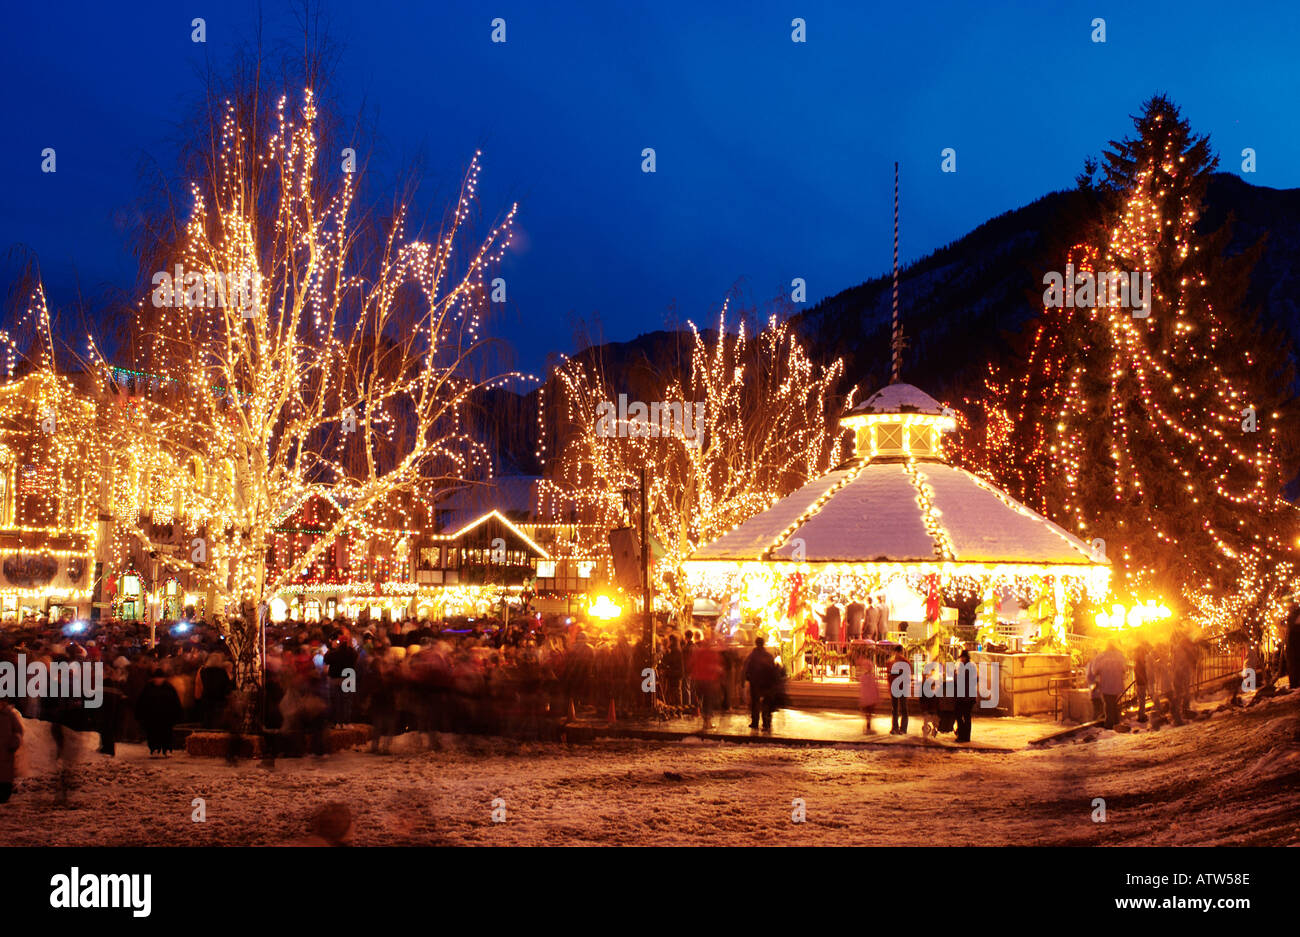 Leavenworth Washington Christmas.Leavenworth Washington Christmas Lights At Night Stock Photo